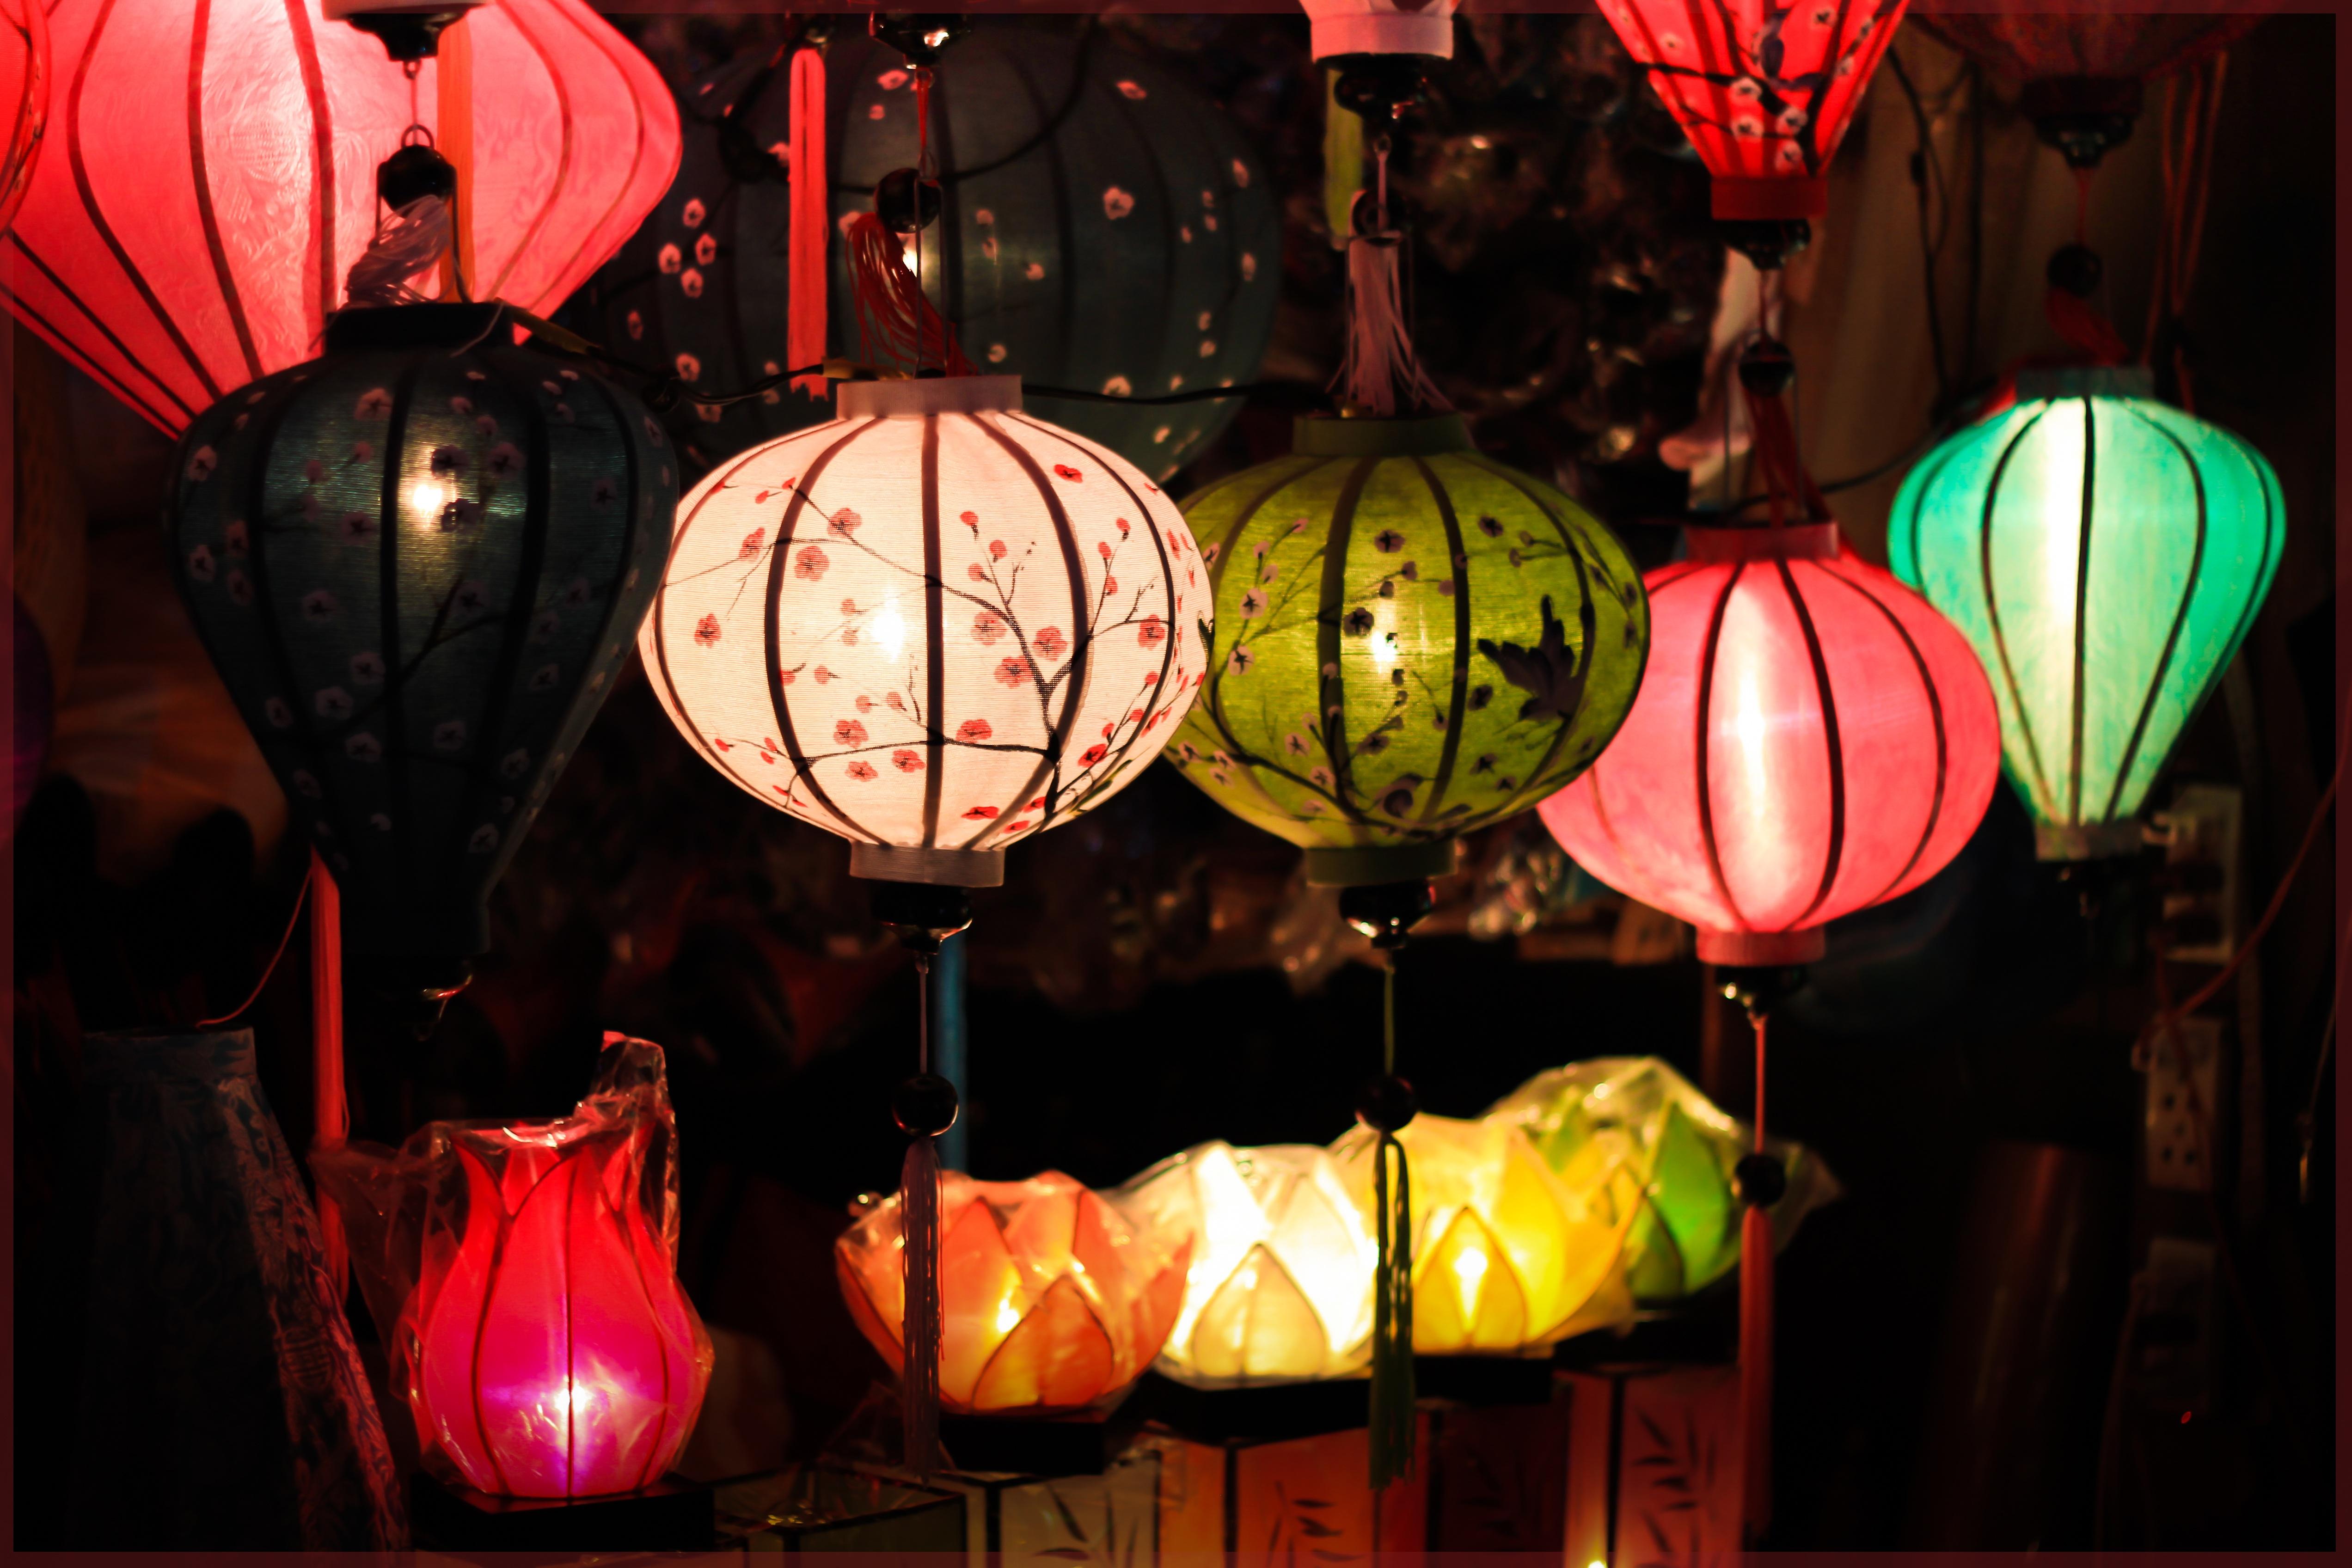 Free images : glowing night vintage balloon old celebration